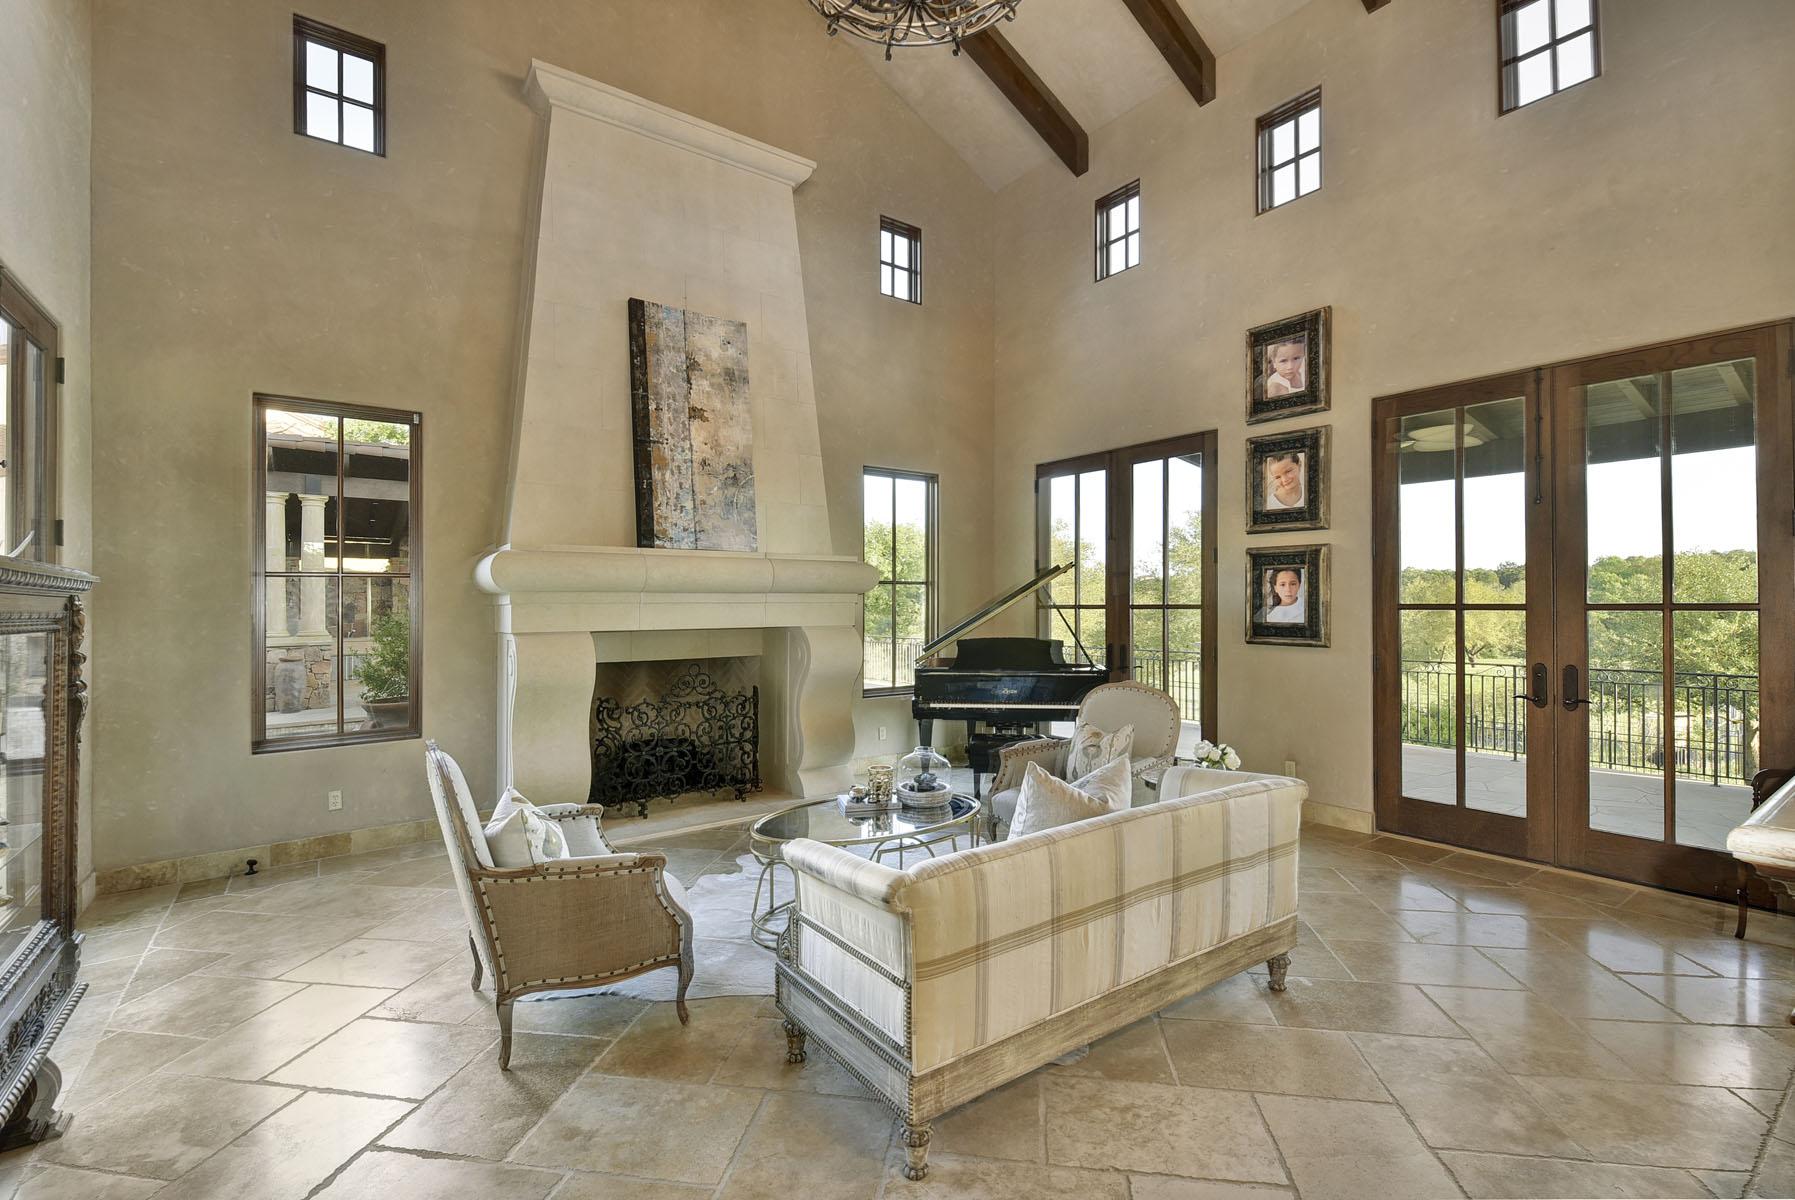 Additional photo for property listing at Old World Elegance 8533 Calera Dr Austin, Texas 78735 Estados Unidos